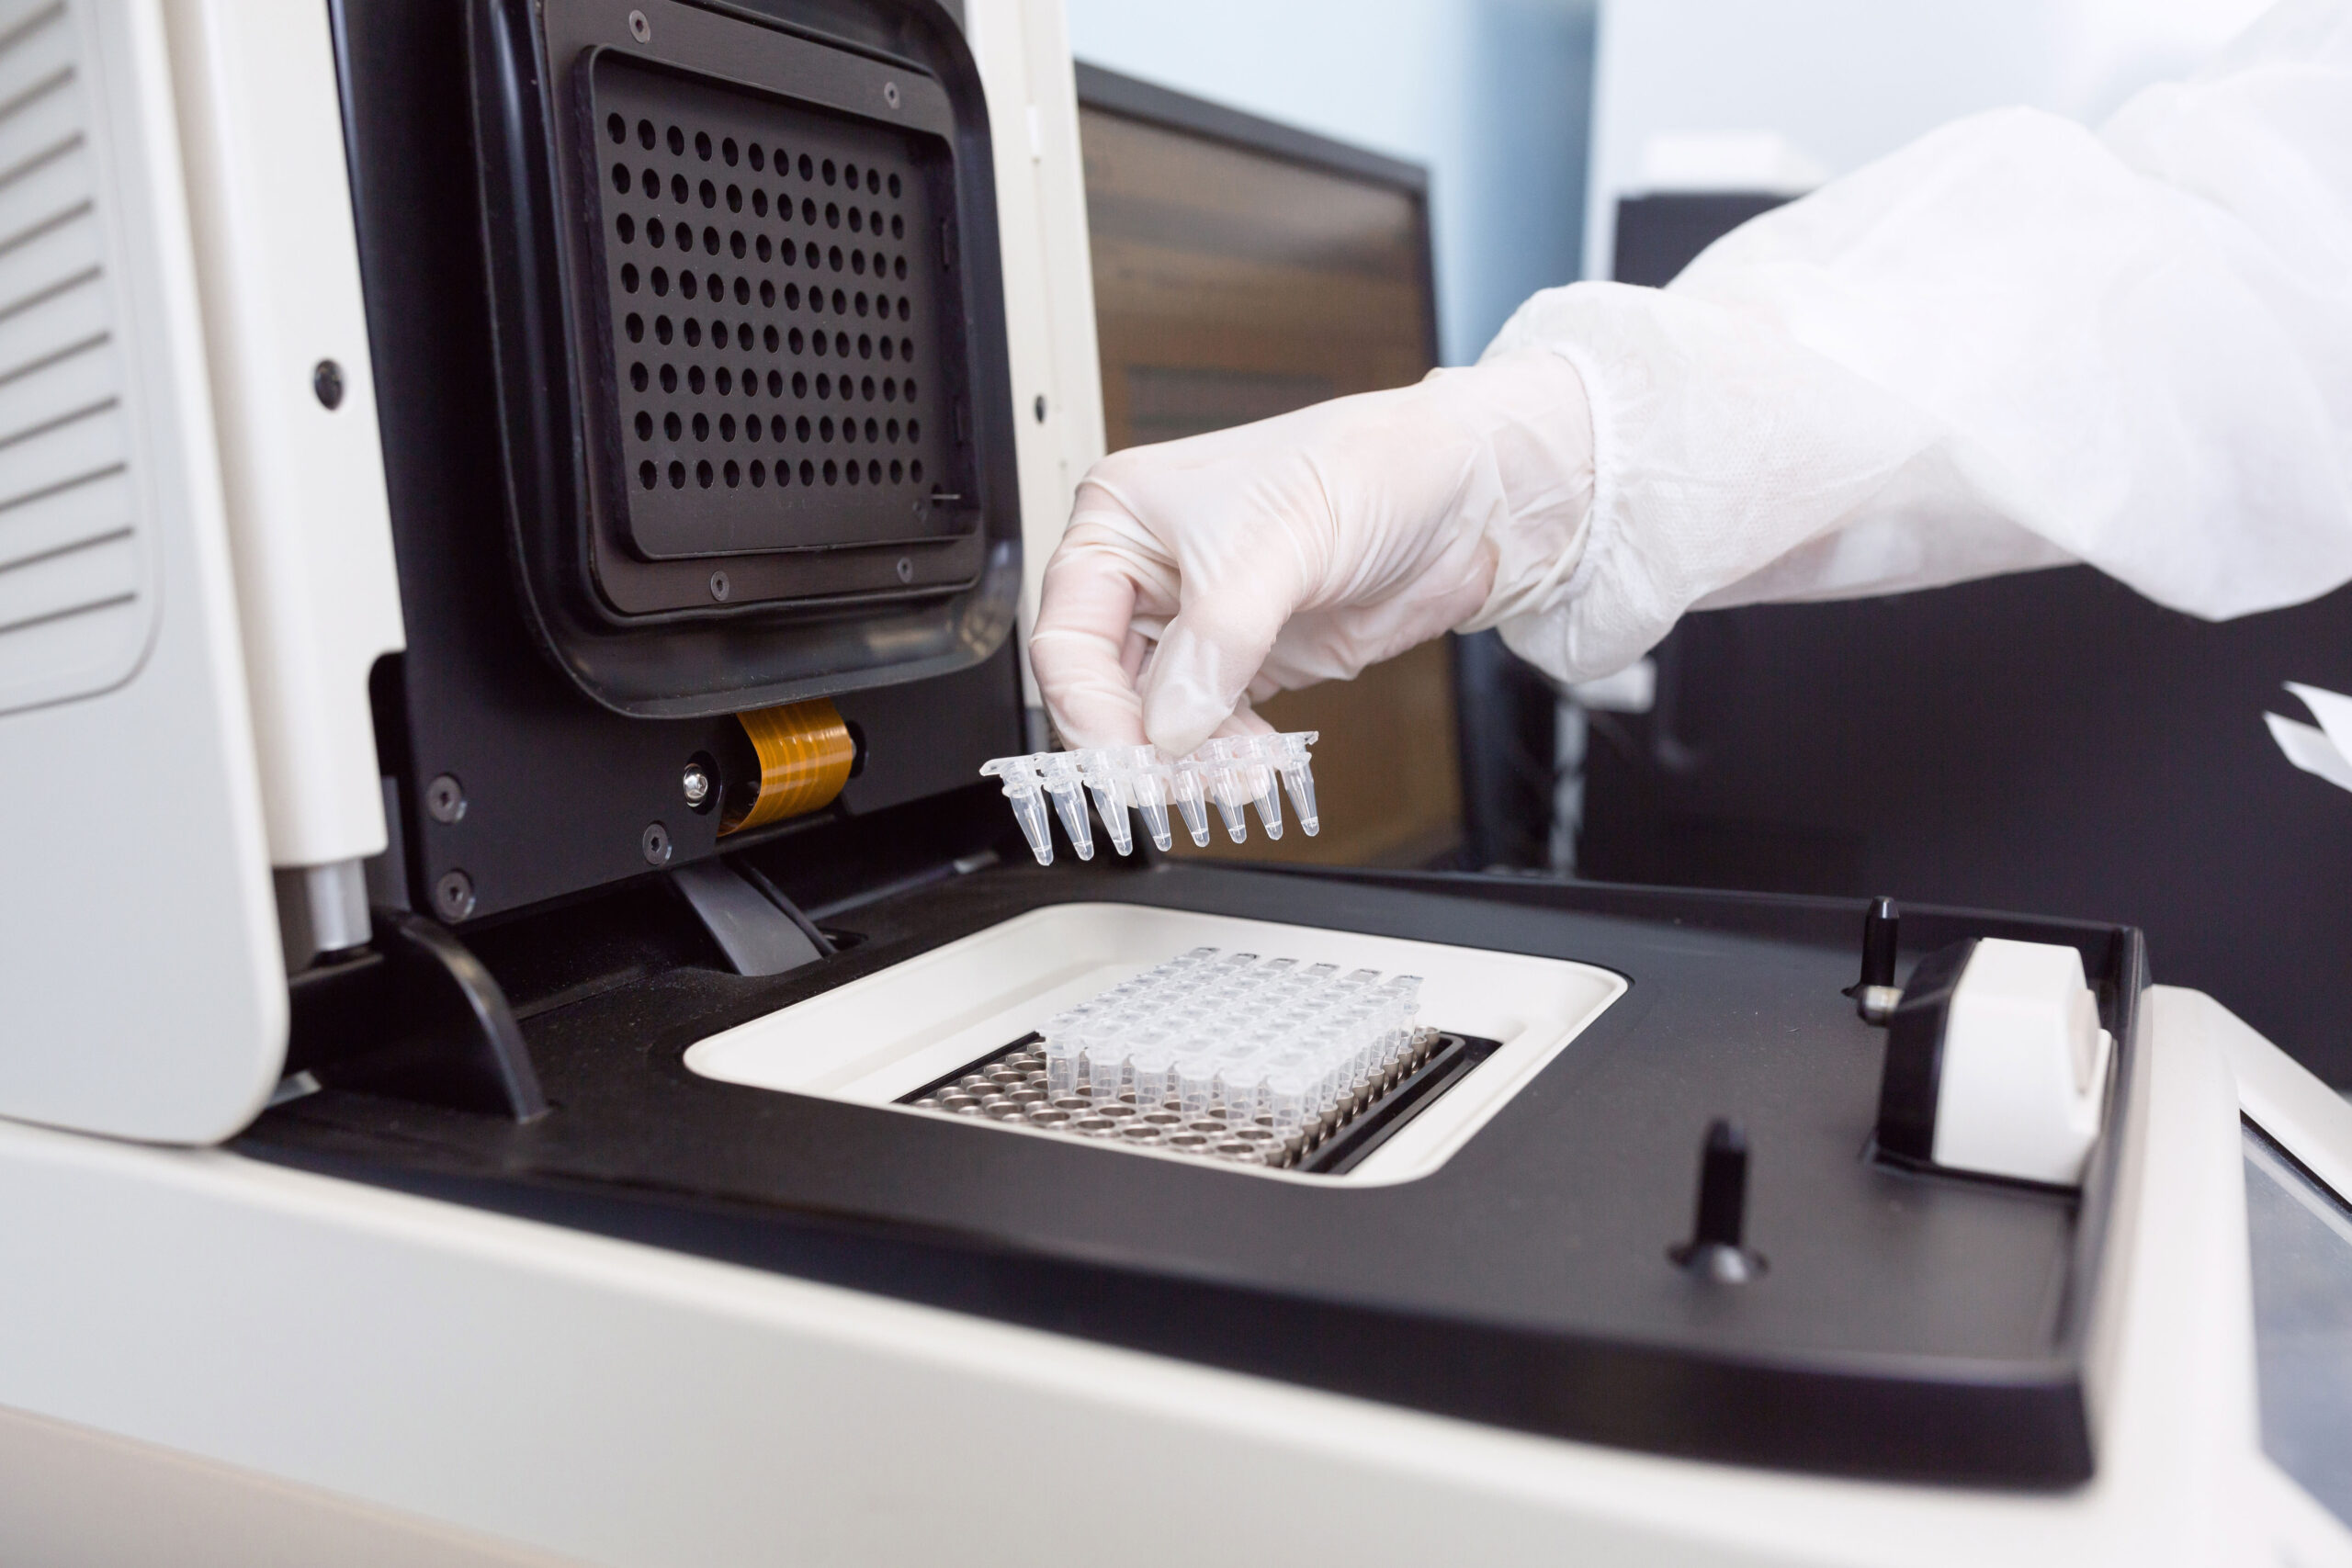 microlab ypiresies molecular analysis